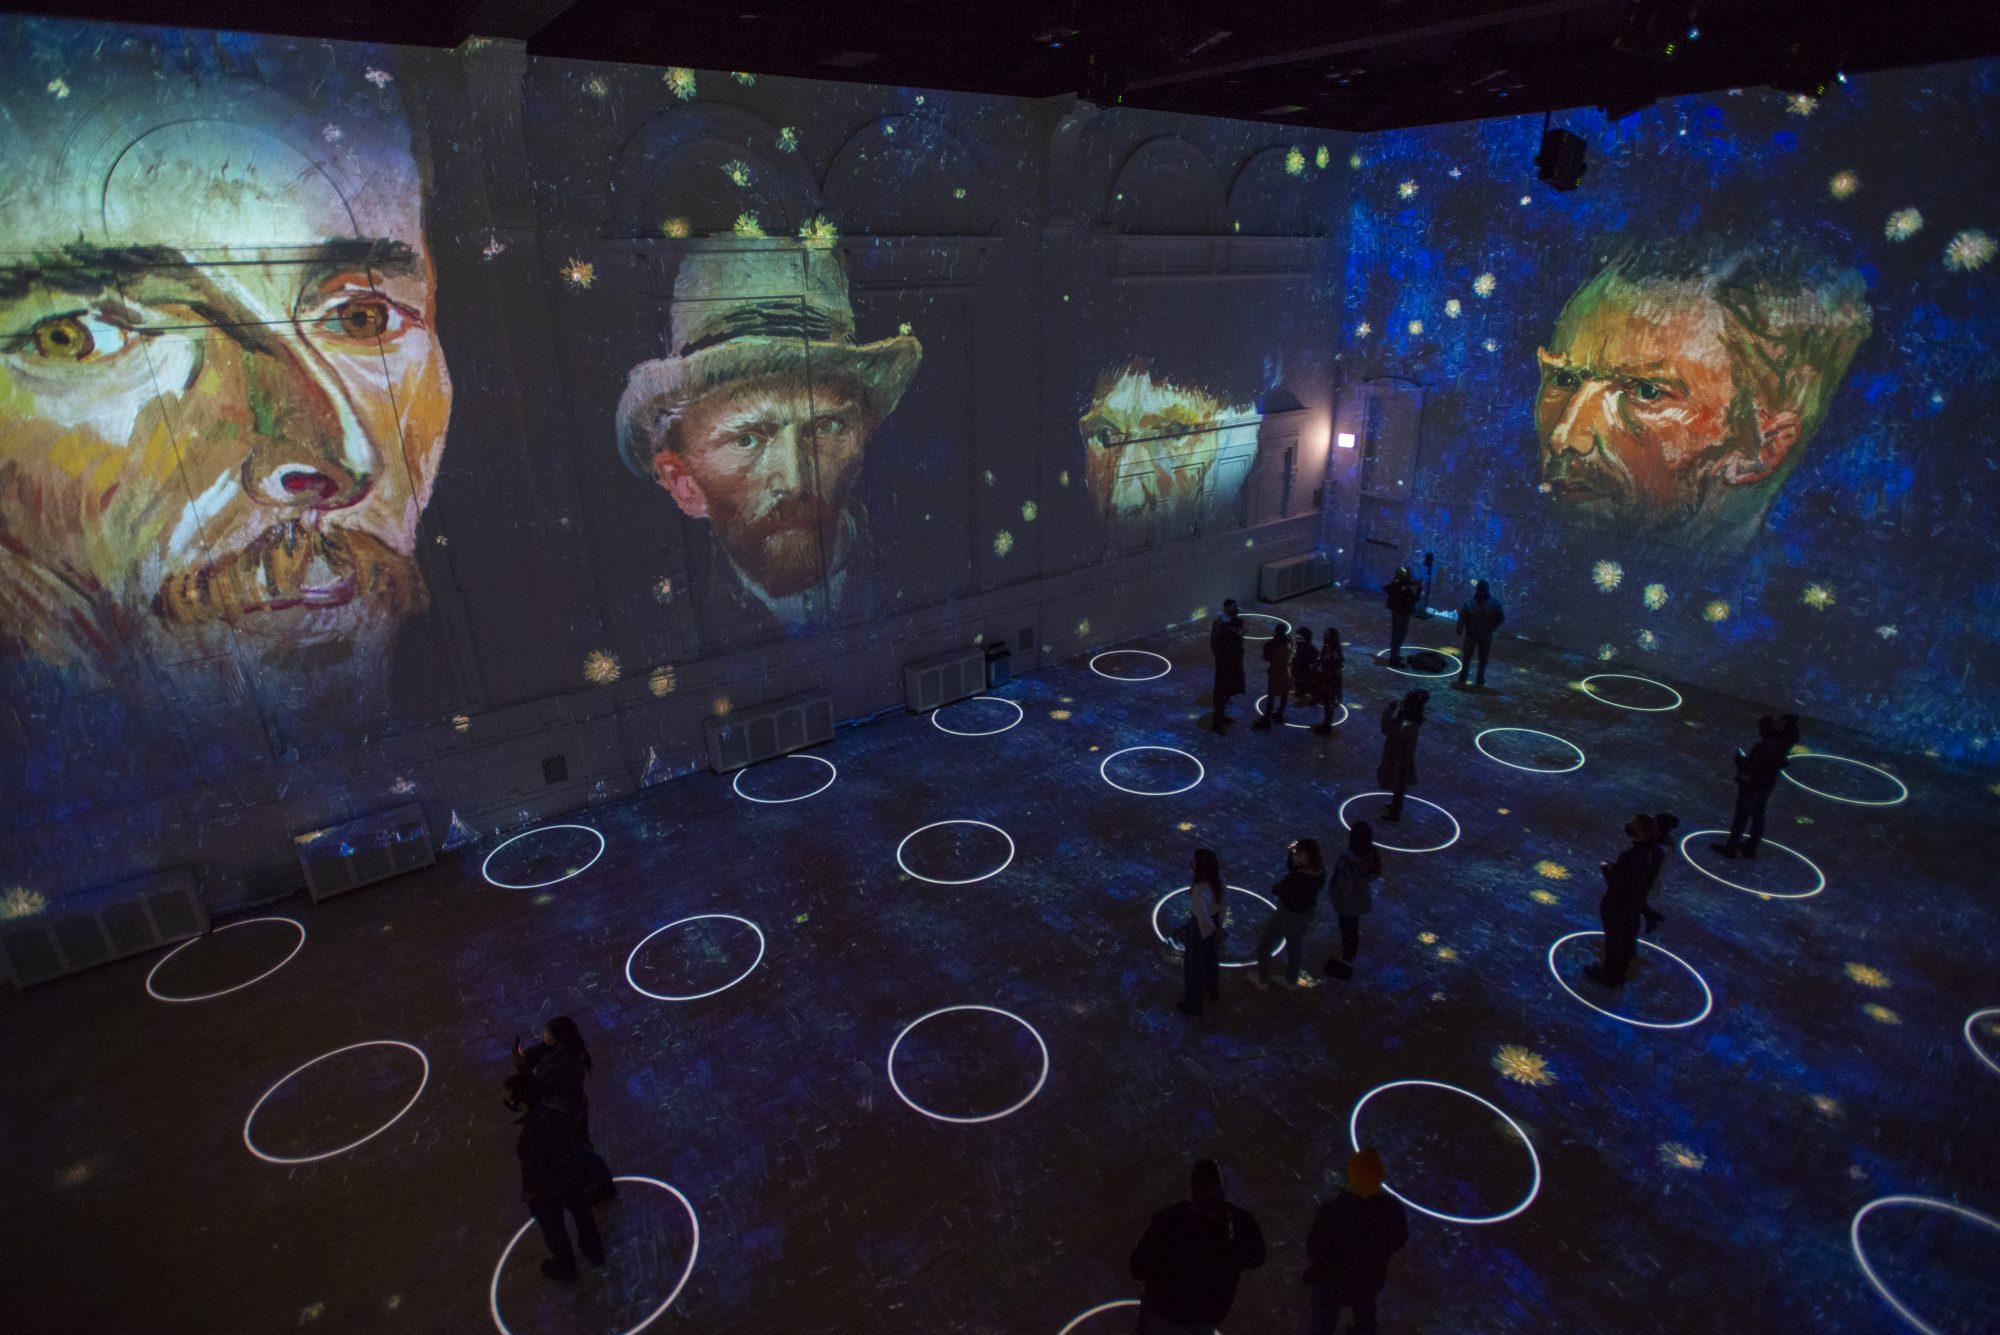 Immersive Van Gogh exhibit - Chicago, self-portraits of the artist